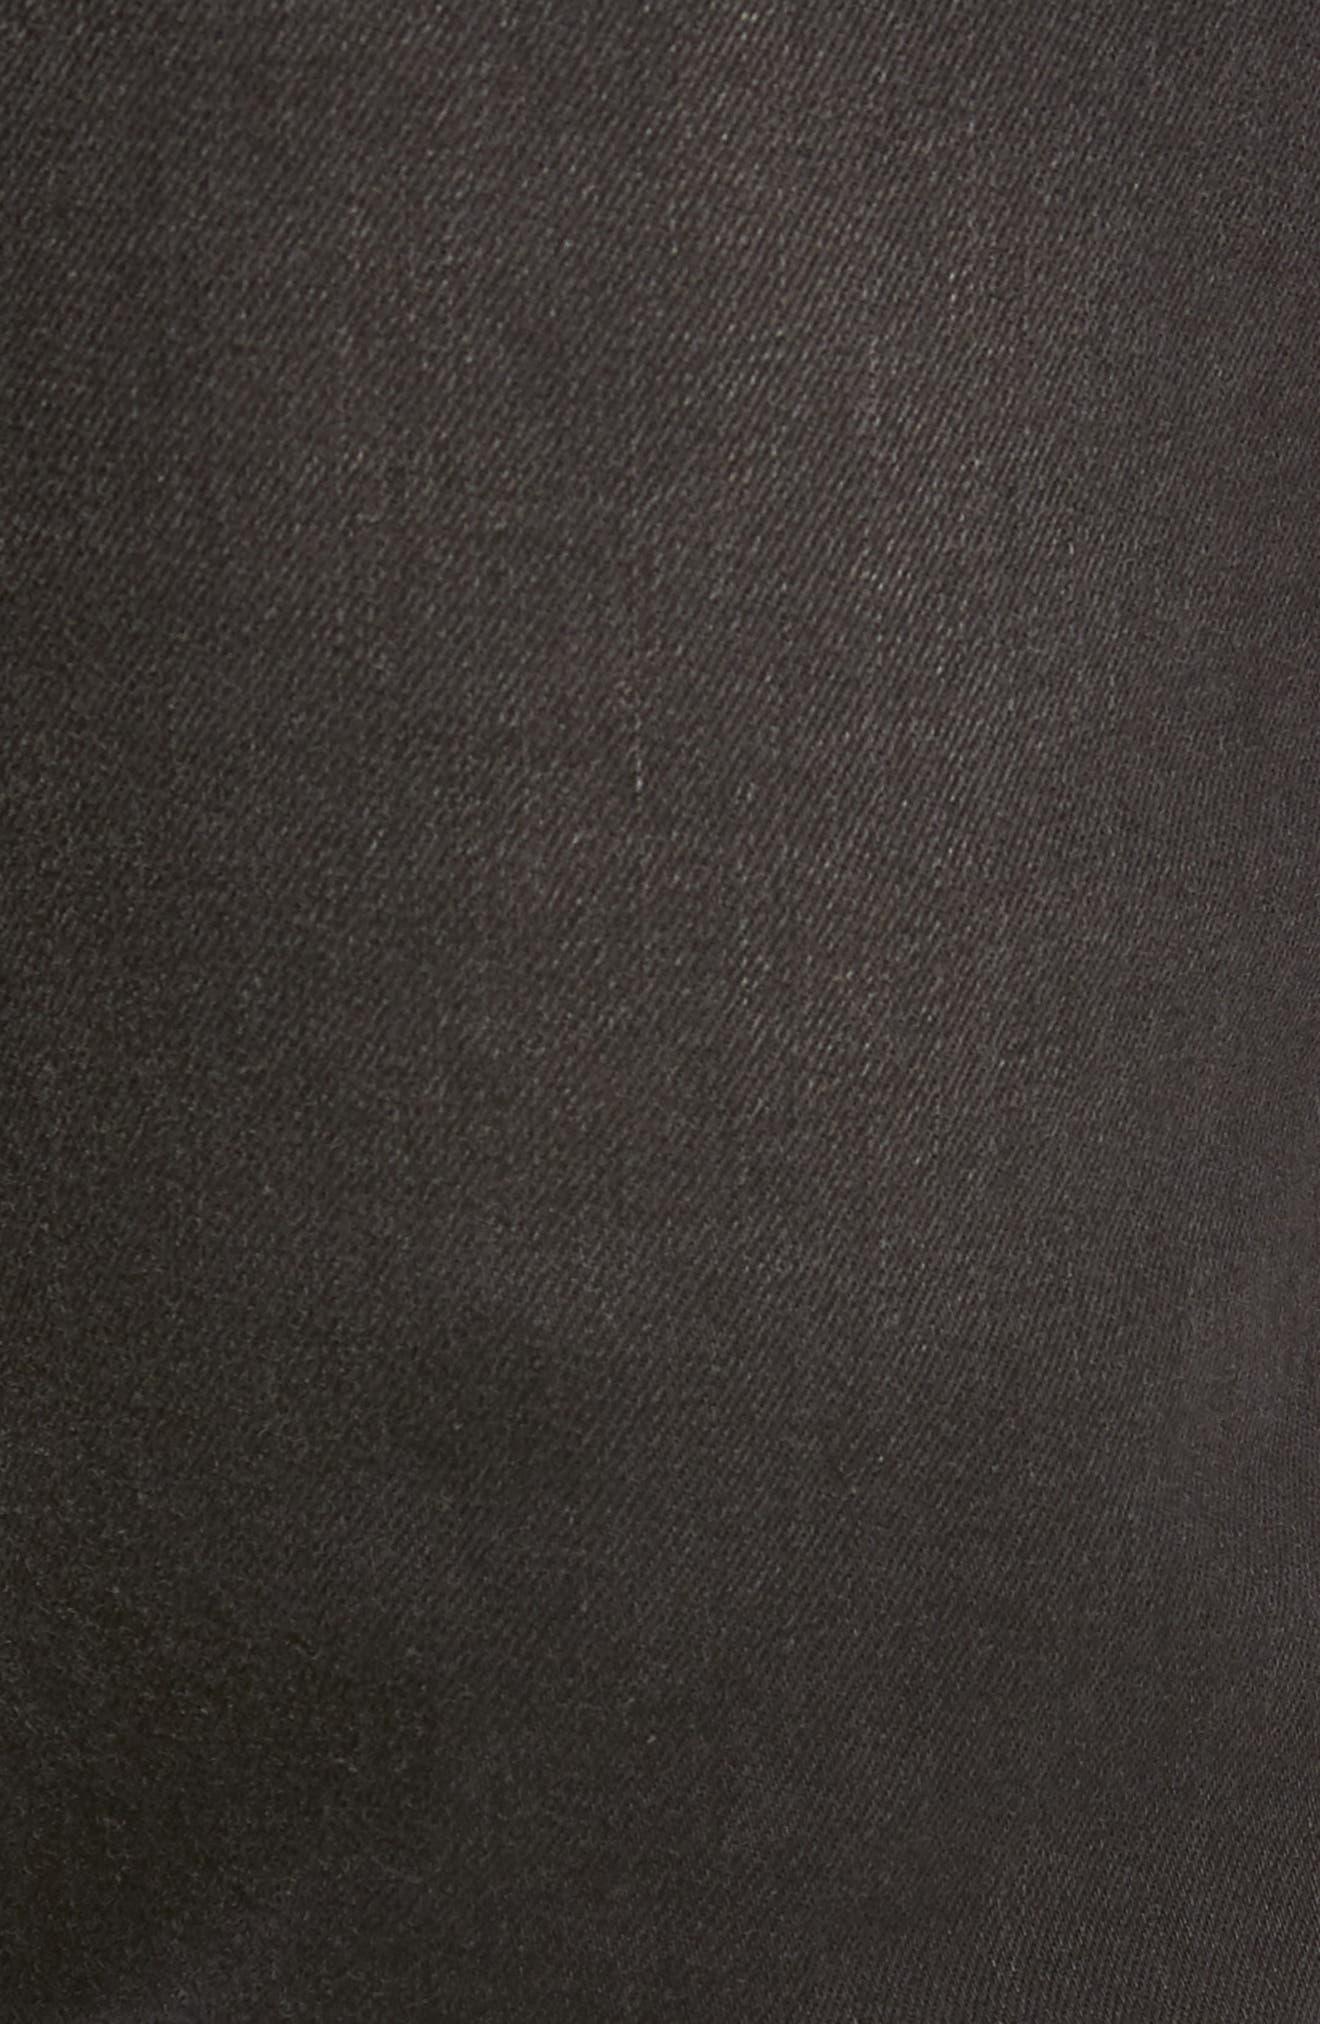 Slim Fit Jeans,                             Alternate thumbnail 5, color,                             BLACK